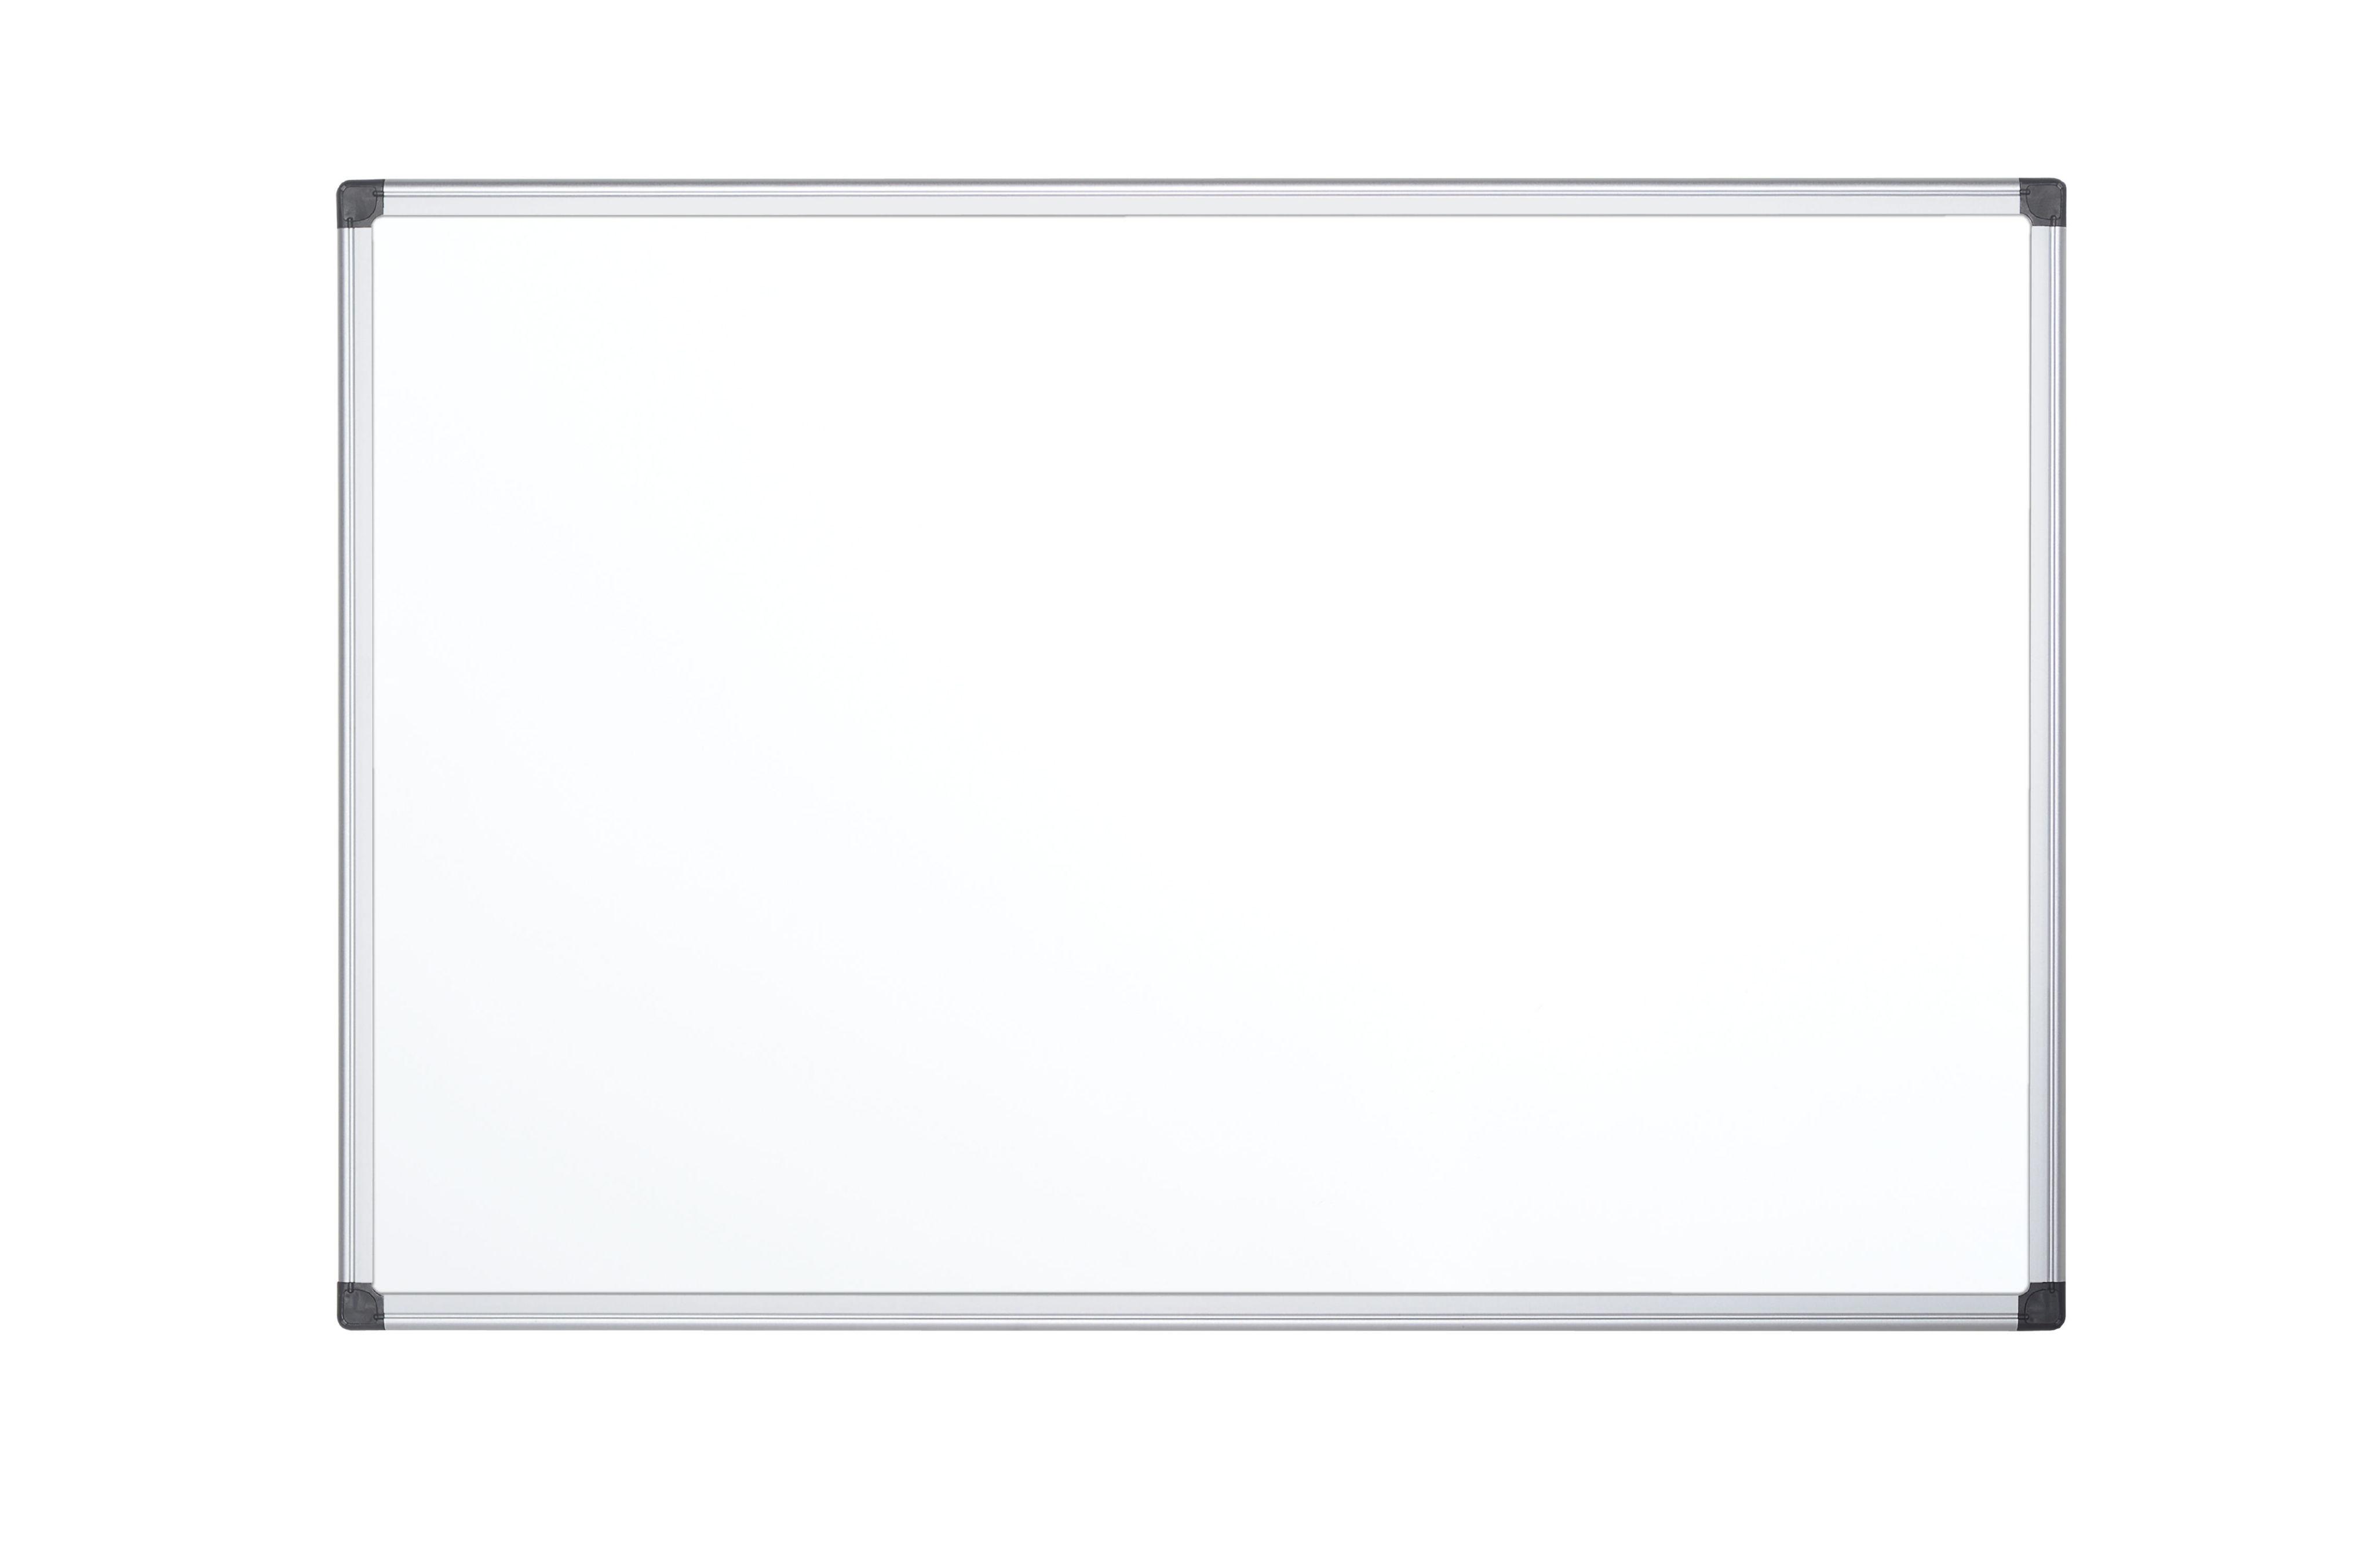 Magnetic Bi-Office Maya Enamel Aluminium Framed Wtbrd 150x100cm